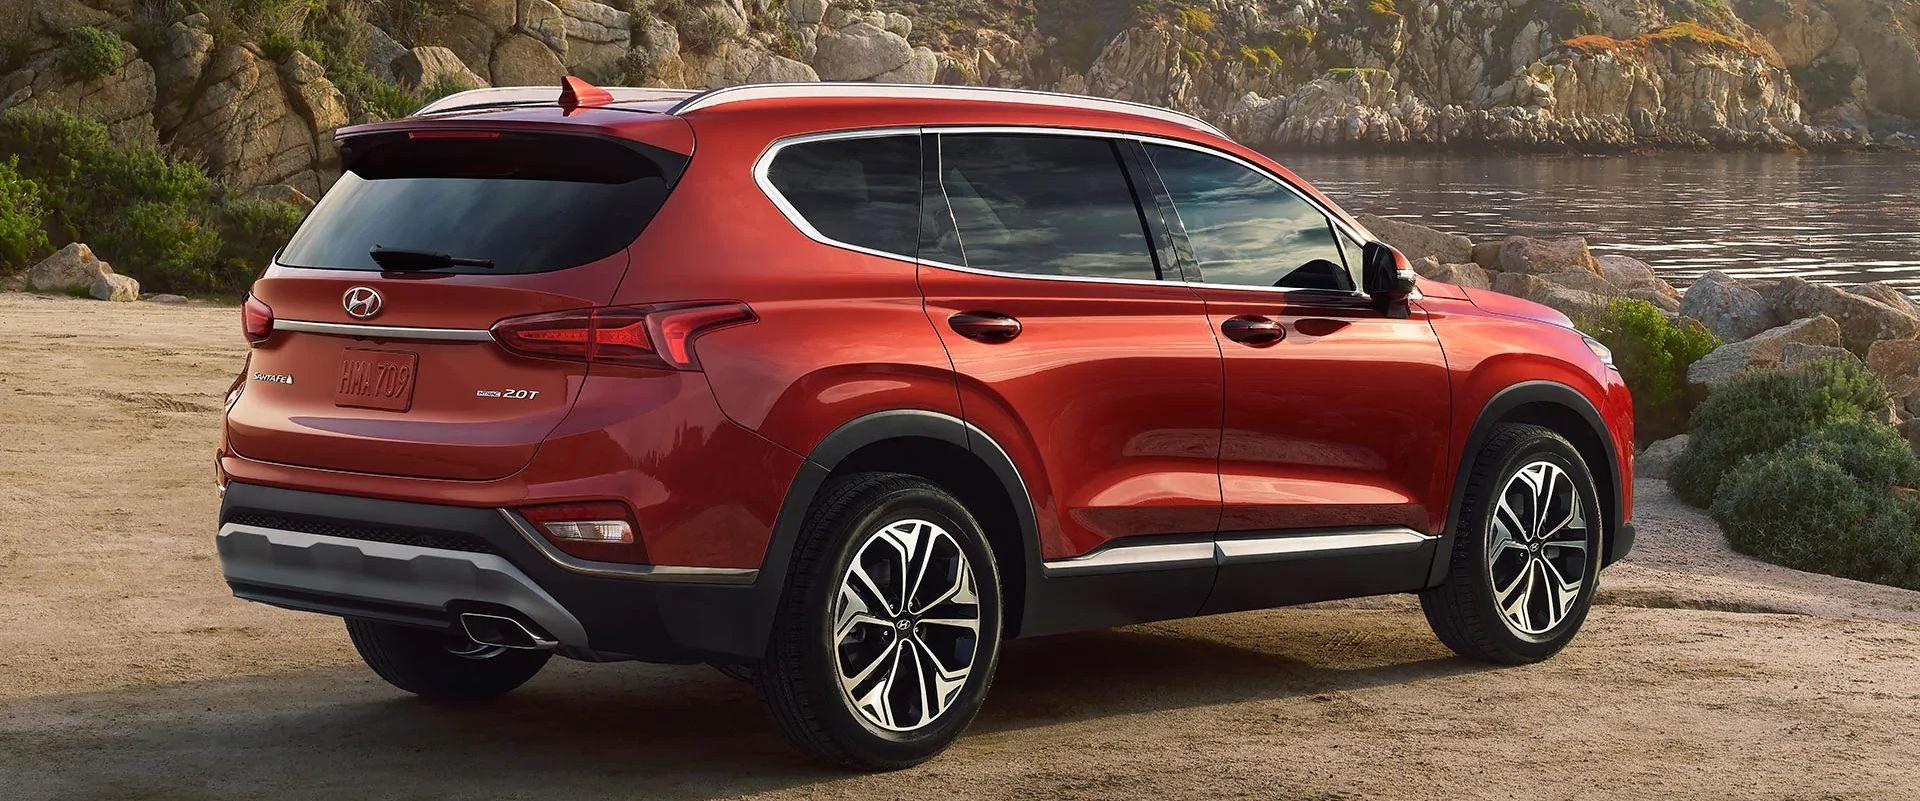 Hyundai Santa Fe 2019 a la venta cerca de Richmond, VA